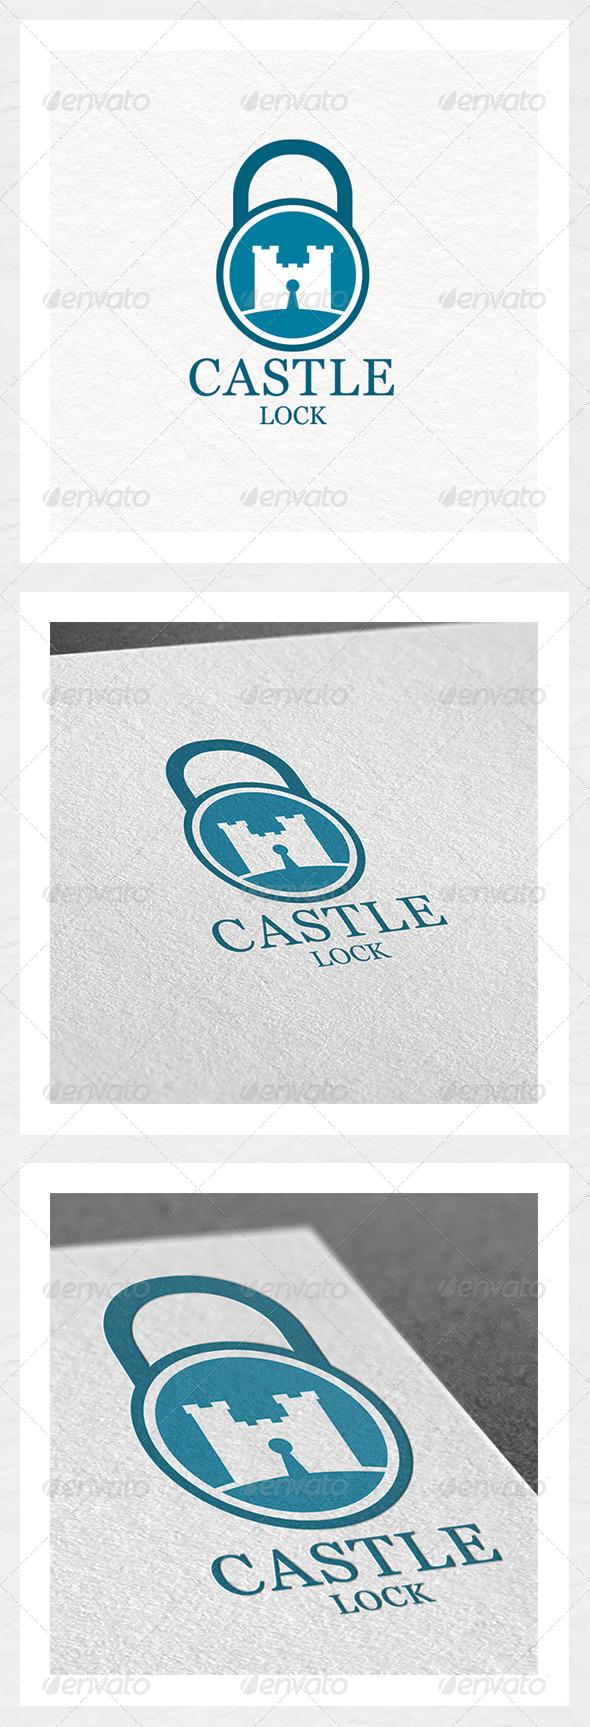 Castle Lock Logo Design - Objects Logo Templates